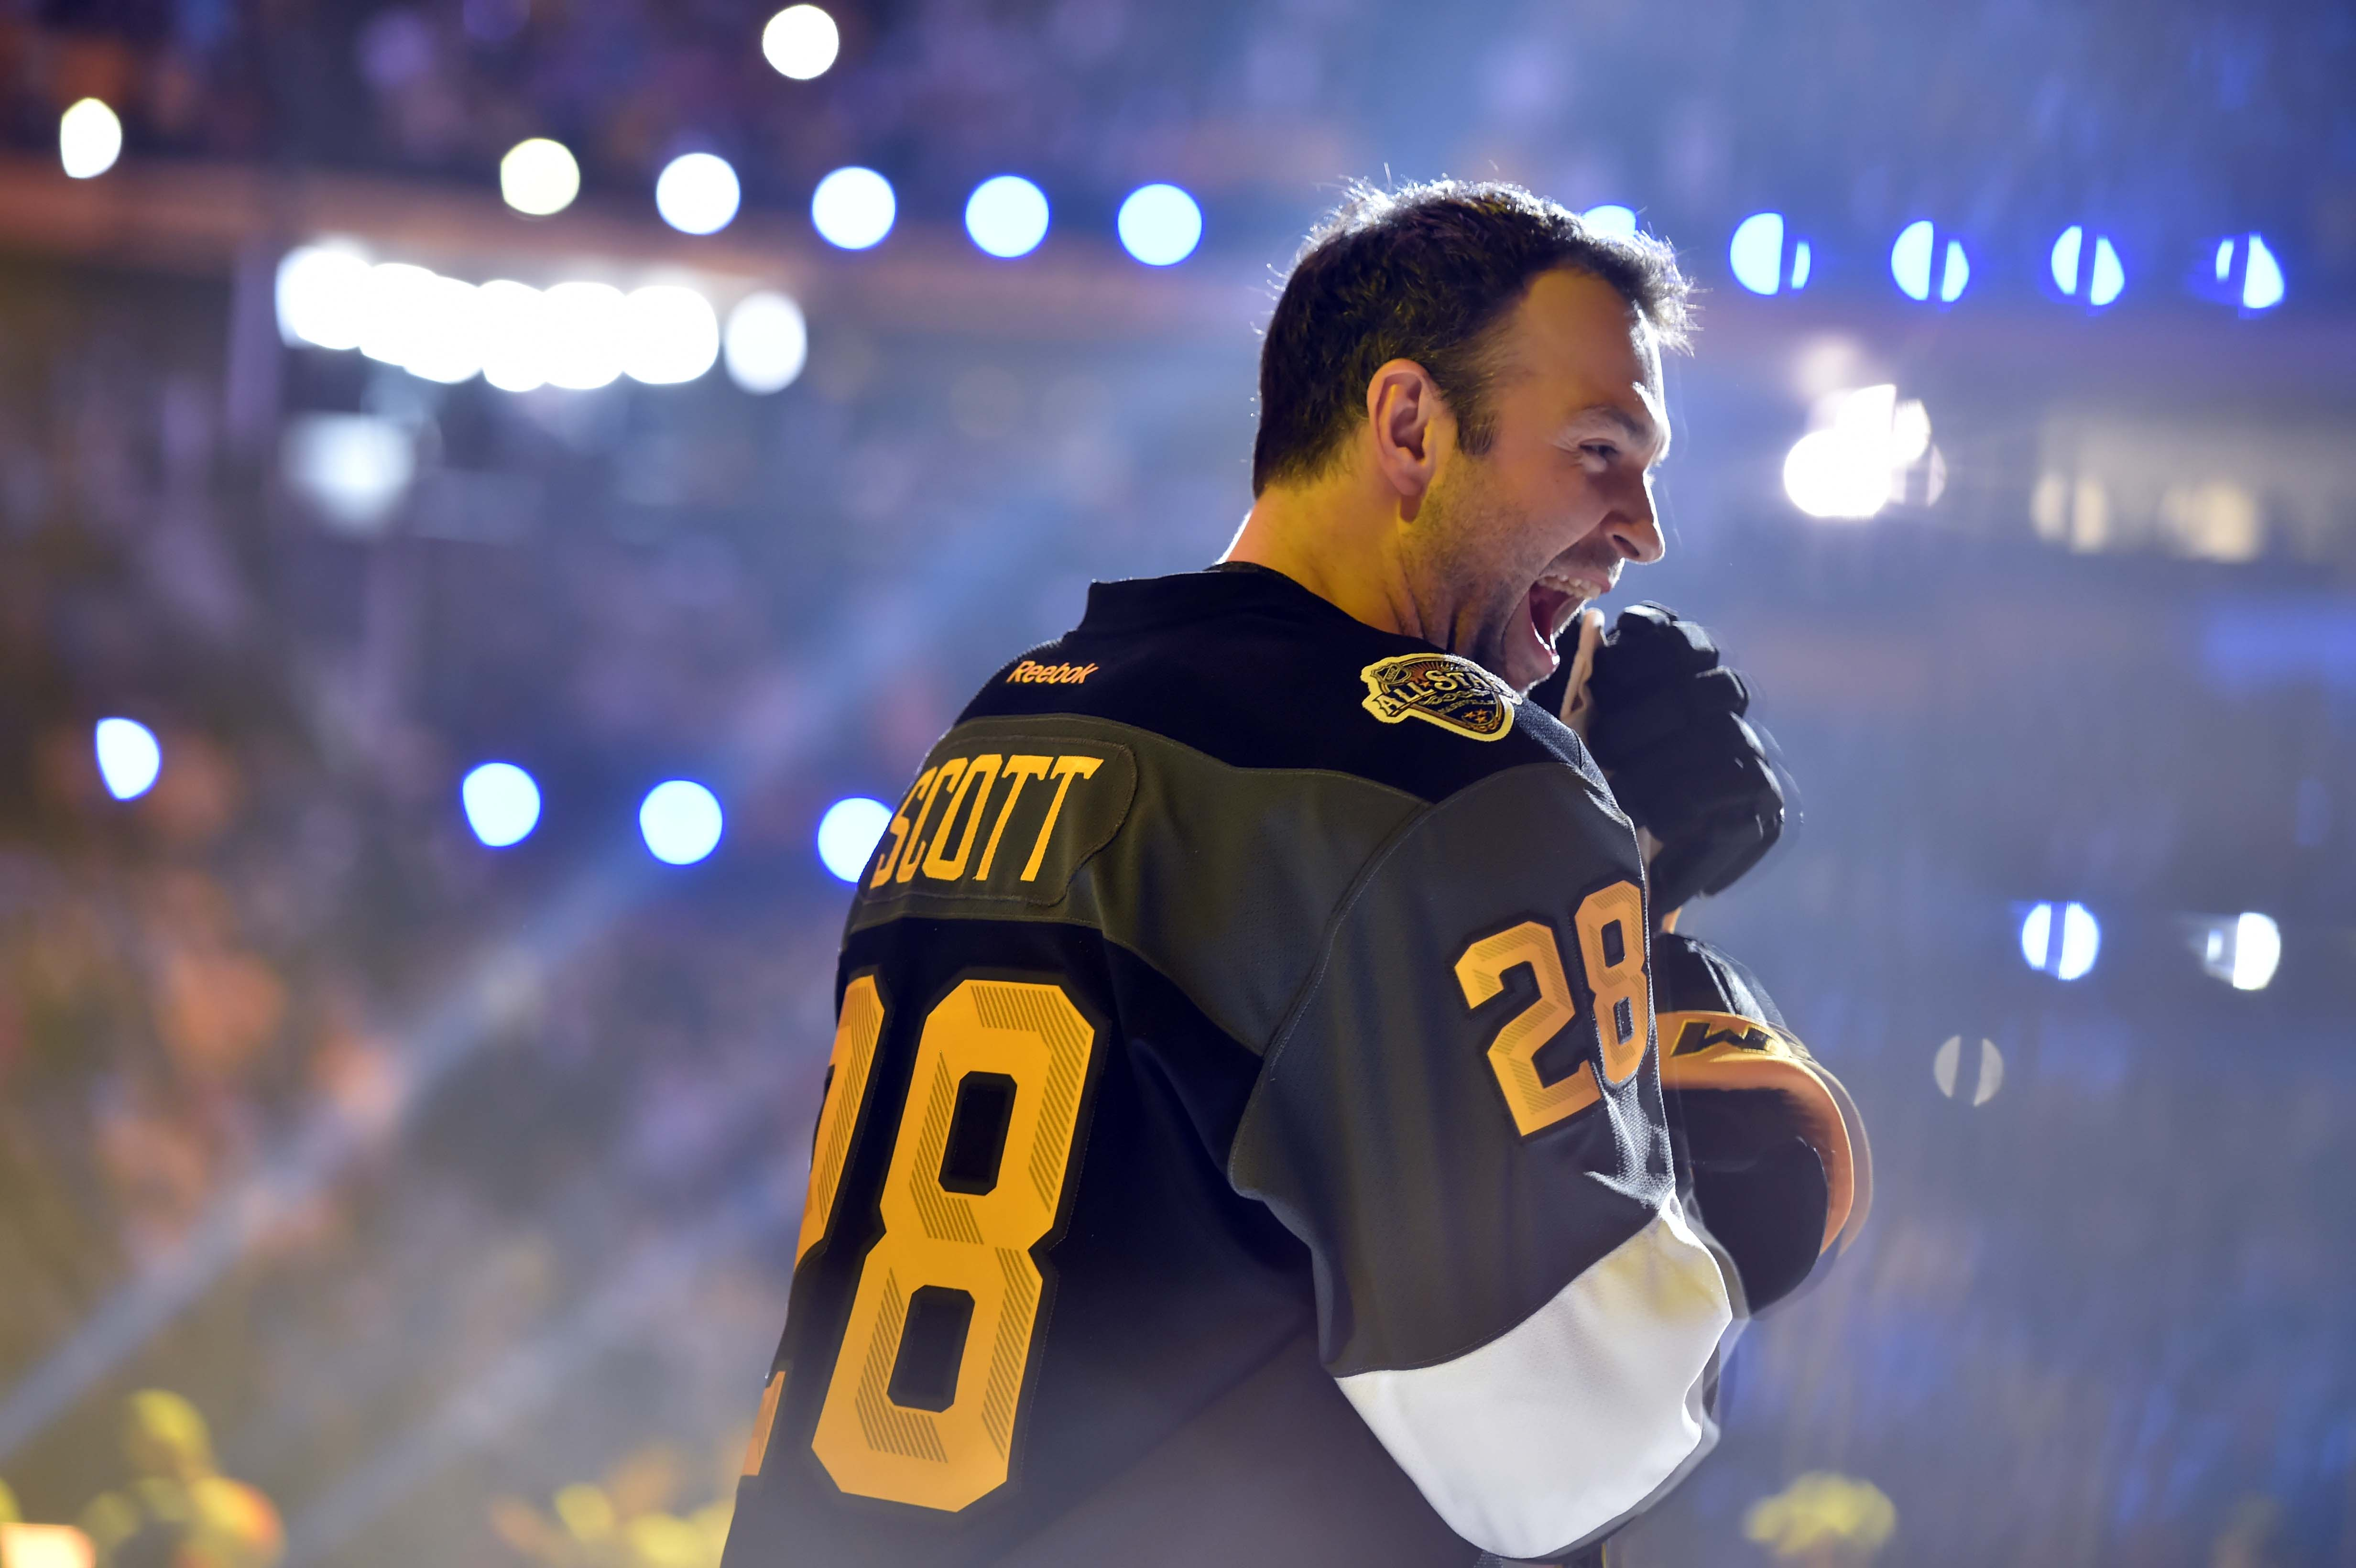 a27408c31 John Scott gave the NHL back to hockey fans - SBNation.com